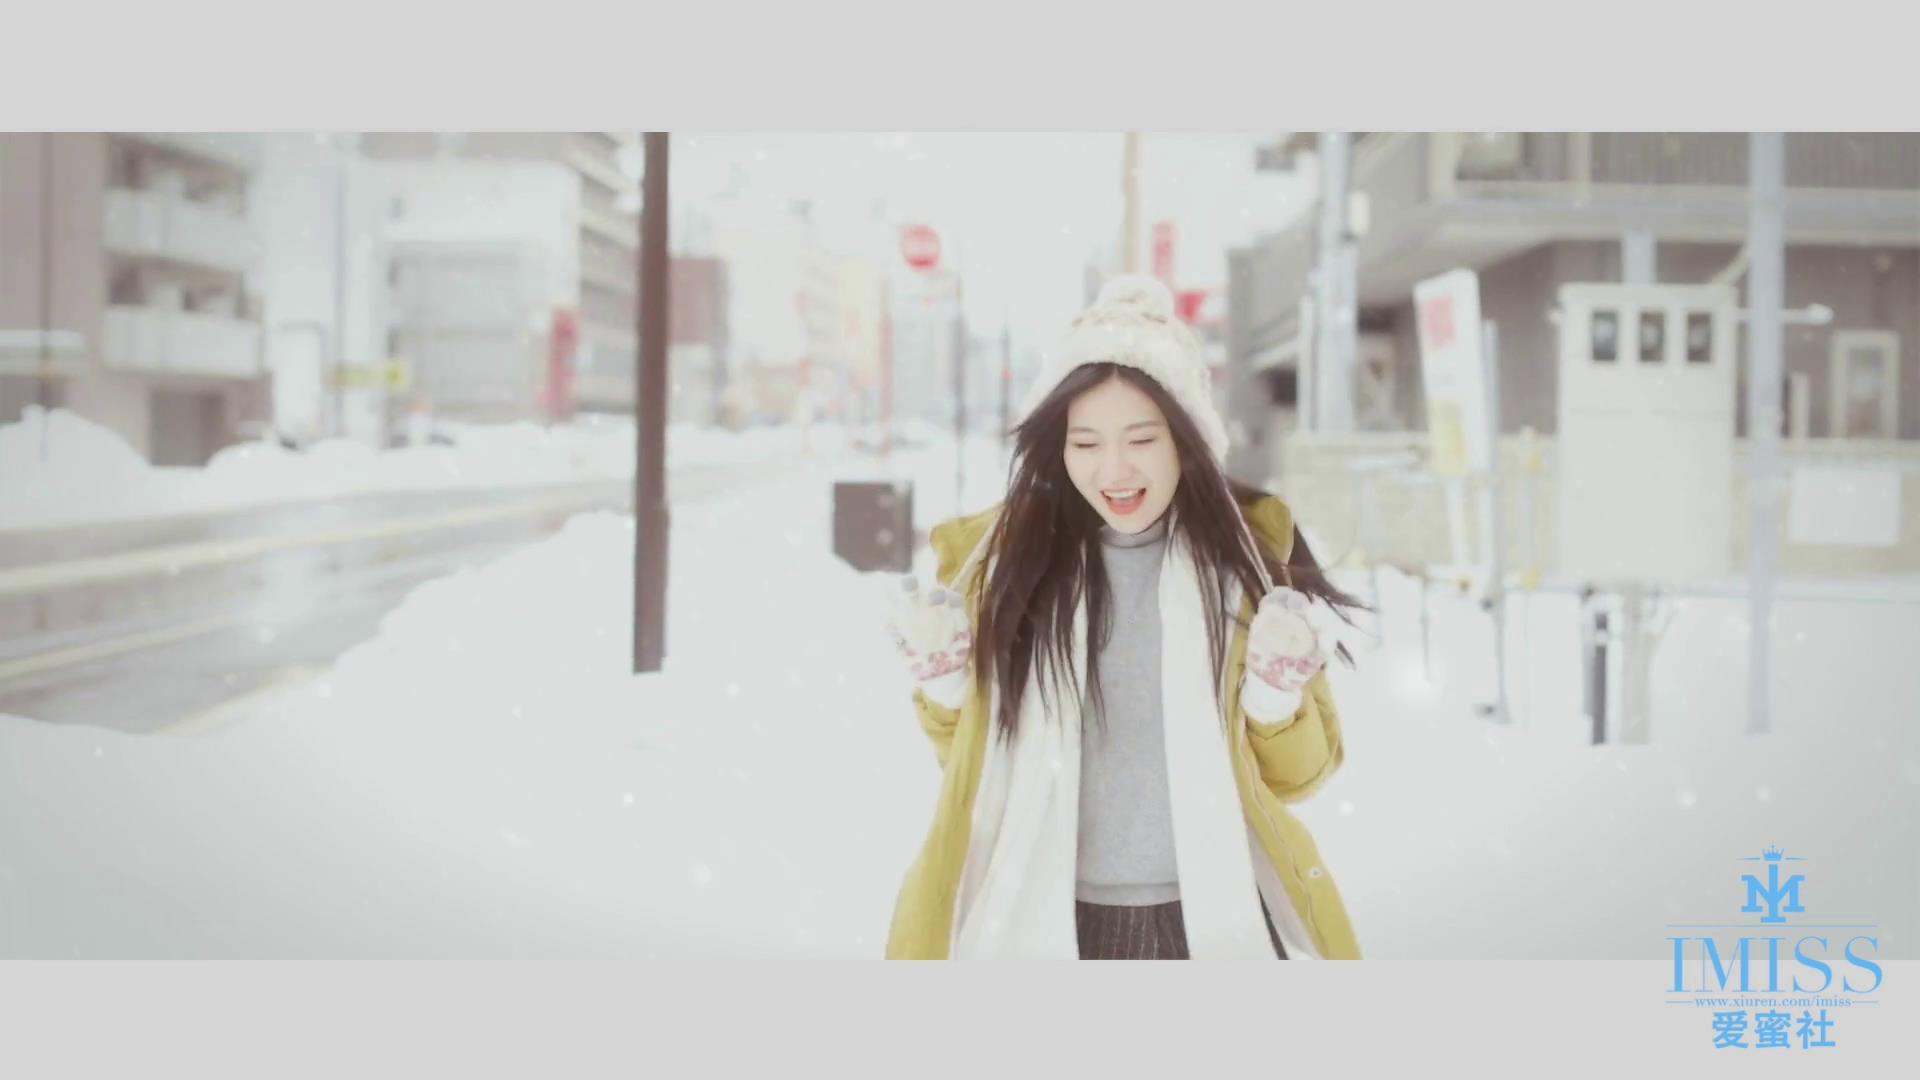 [IMiss爱蜜社]2018.03.28 VN.026 许诺Sabrina[1V/118MB]